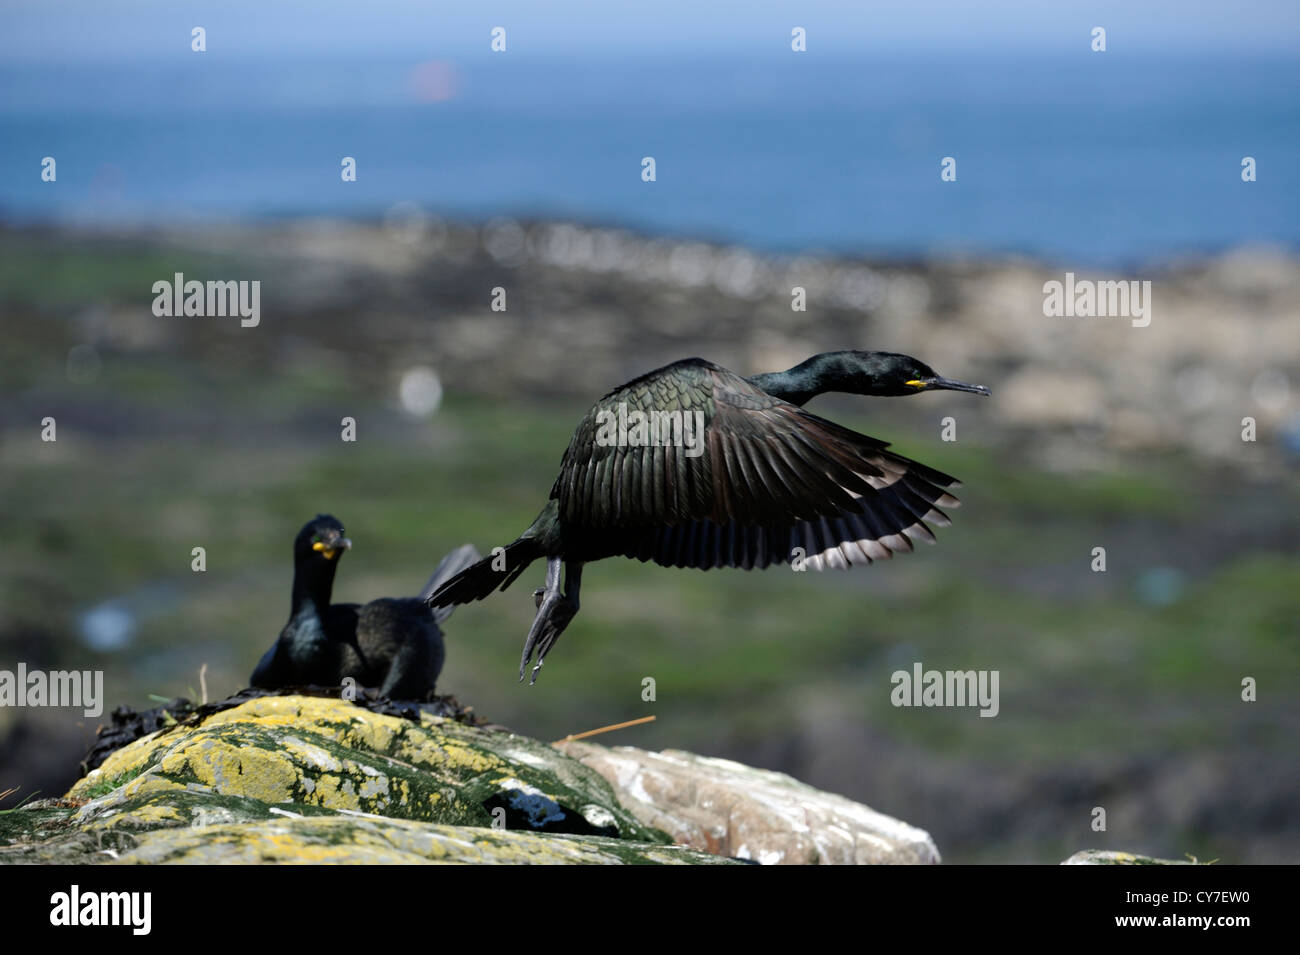 European shag (Phalacrocorax aristotelis) - Stock Image